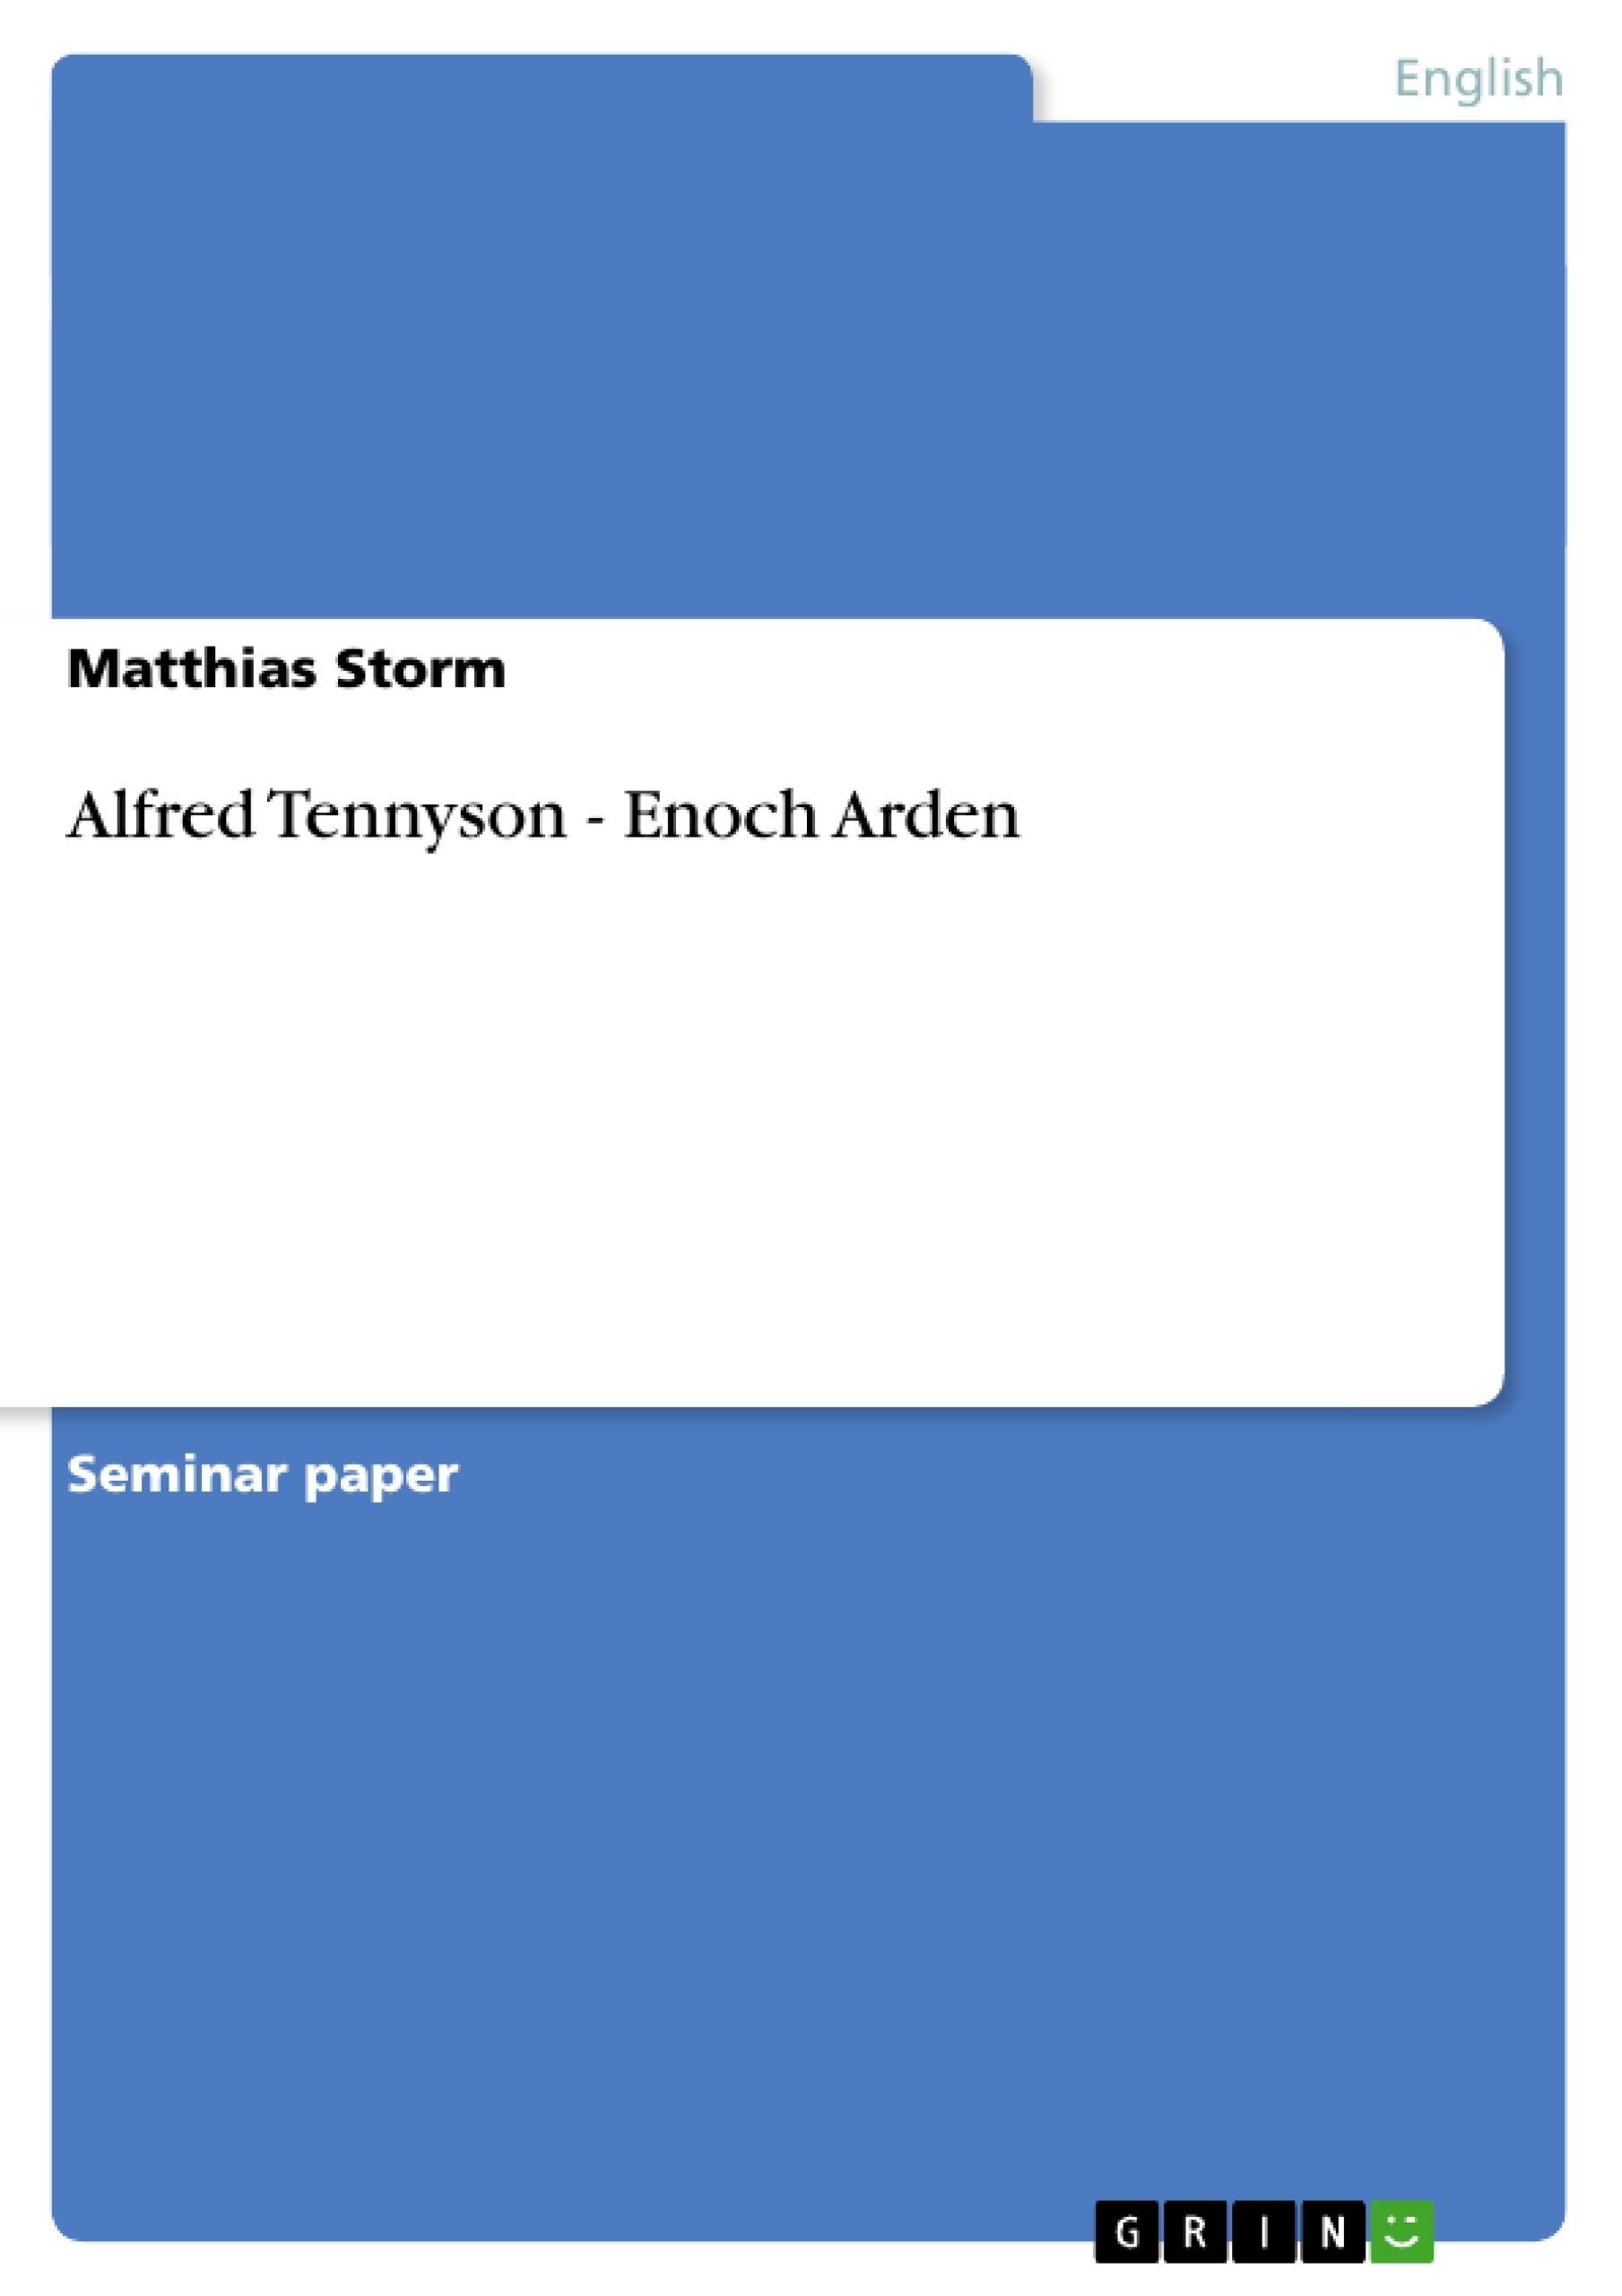 Title: Alfred Tennyson - Enoch Arden